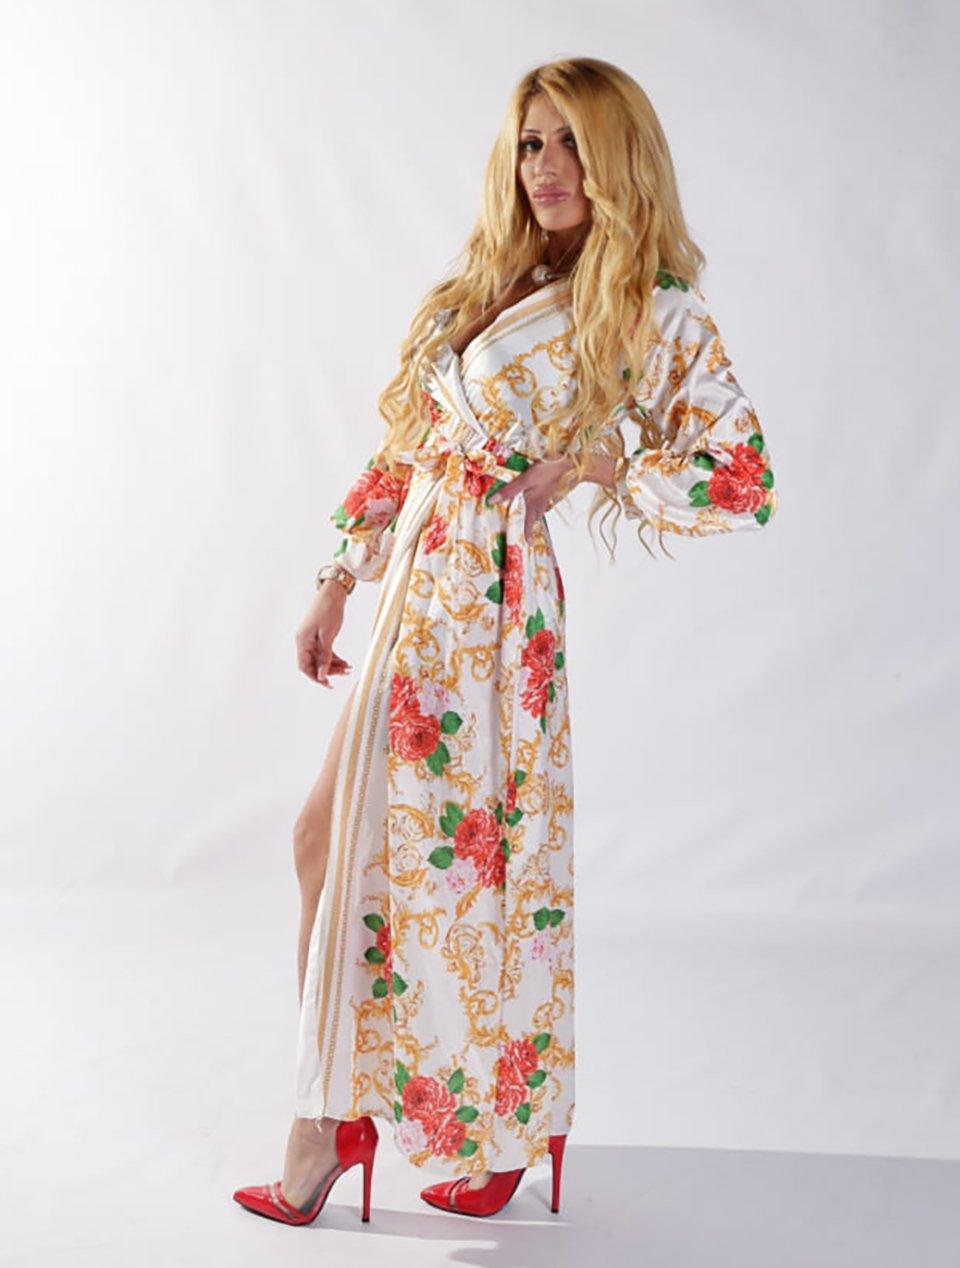 Marianna Fortuna modella